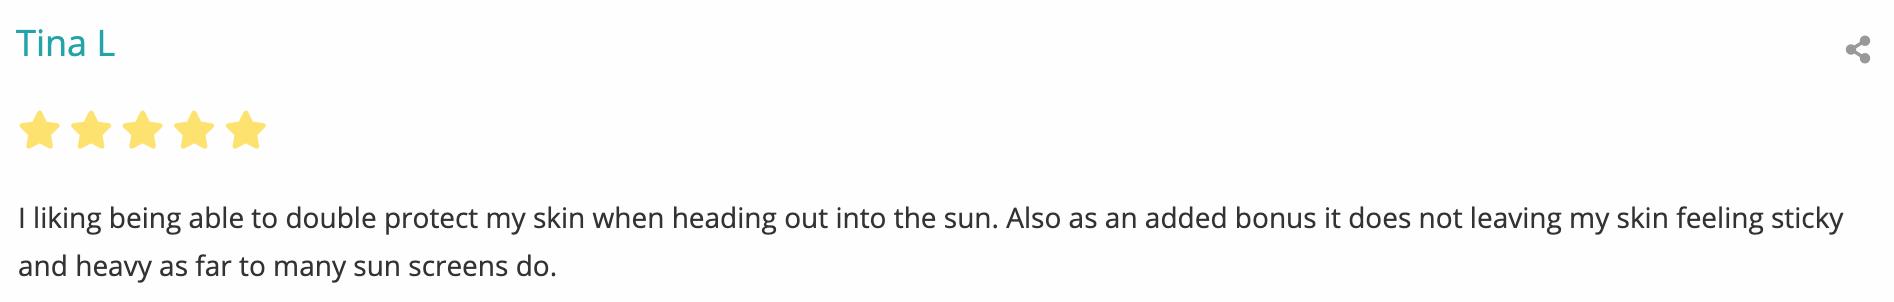 spf-30 sun cream review